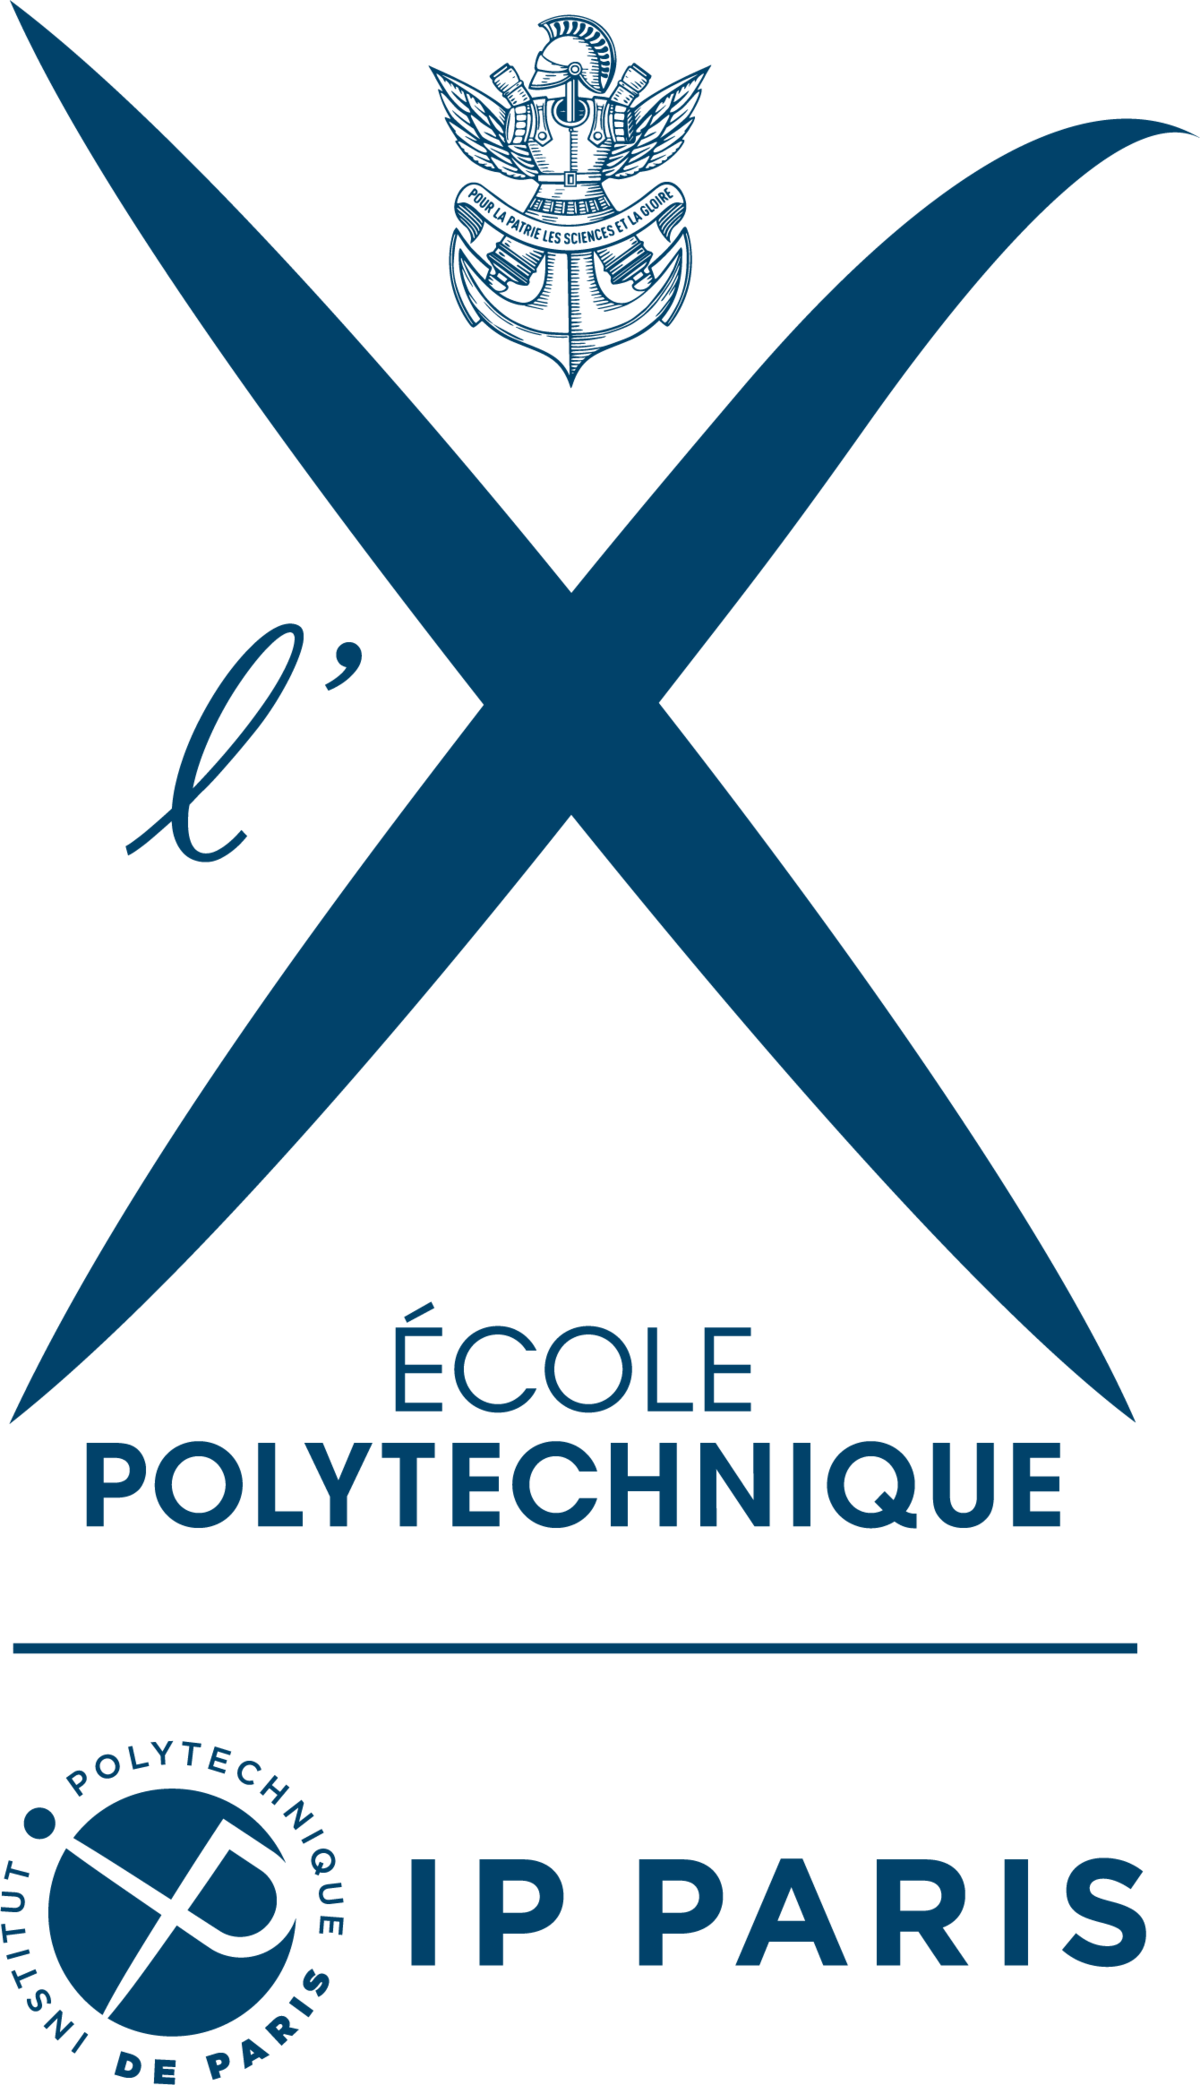 Ecole Polytechnique Wikipedia